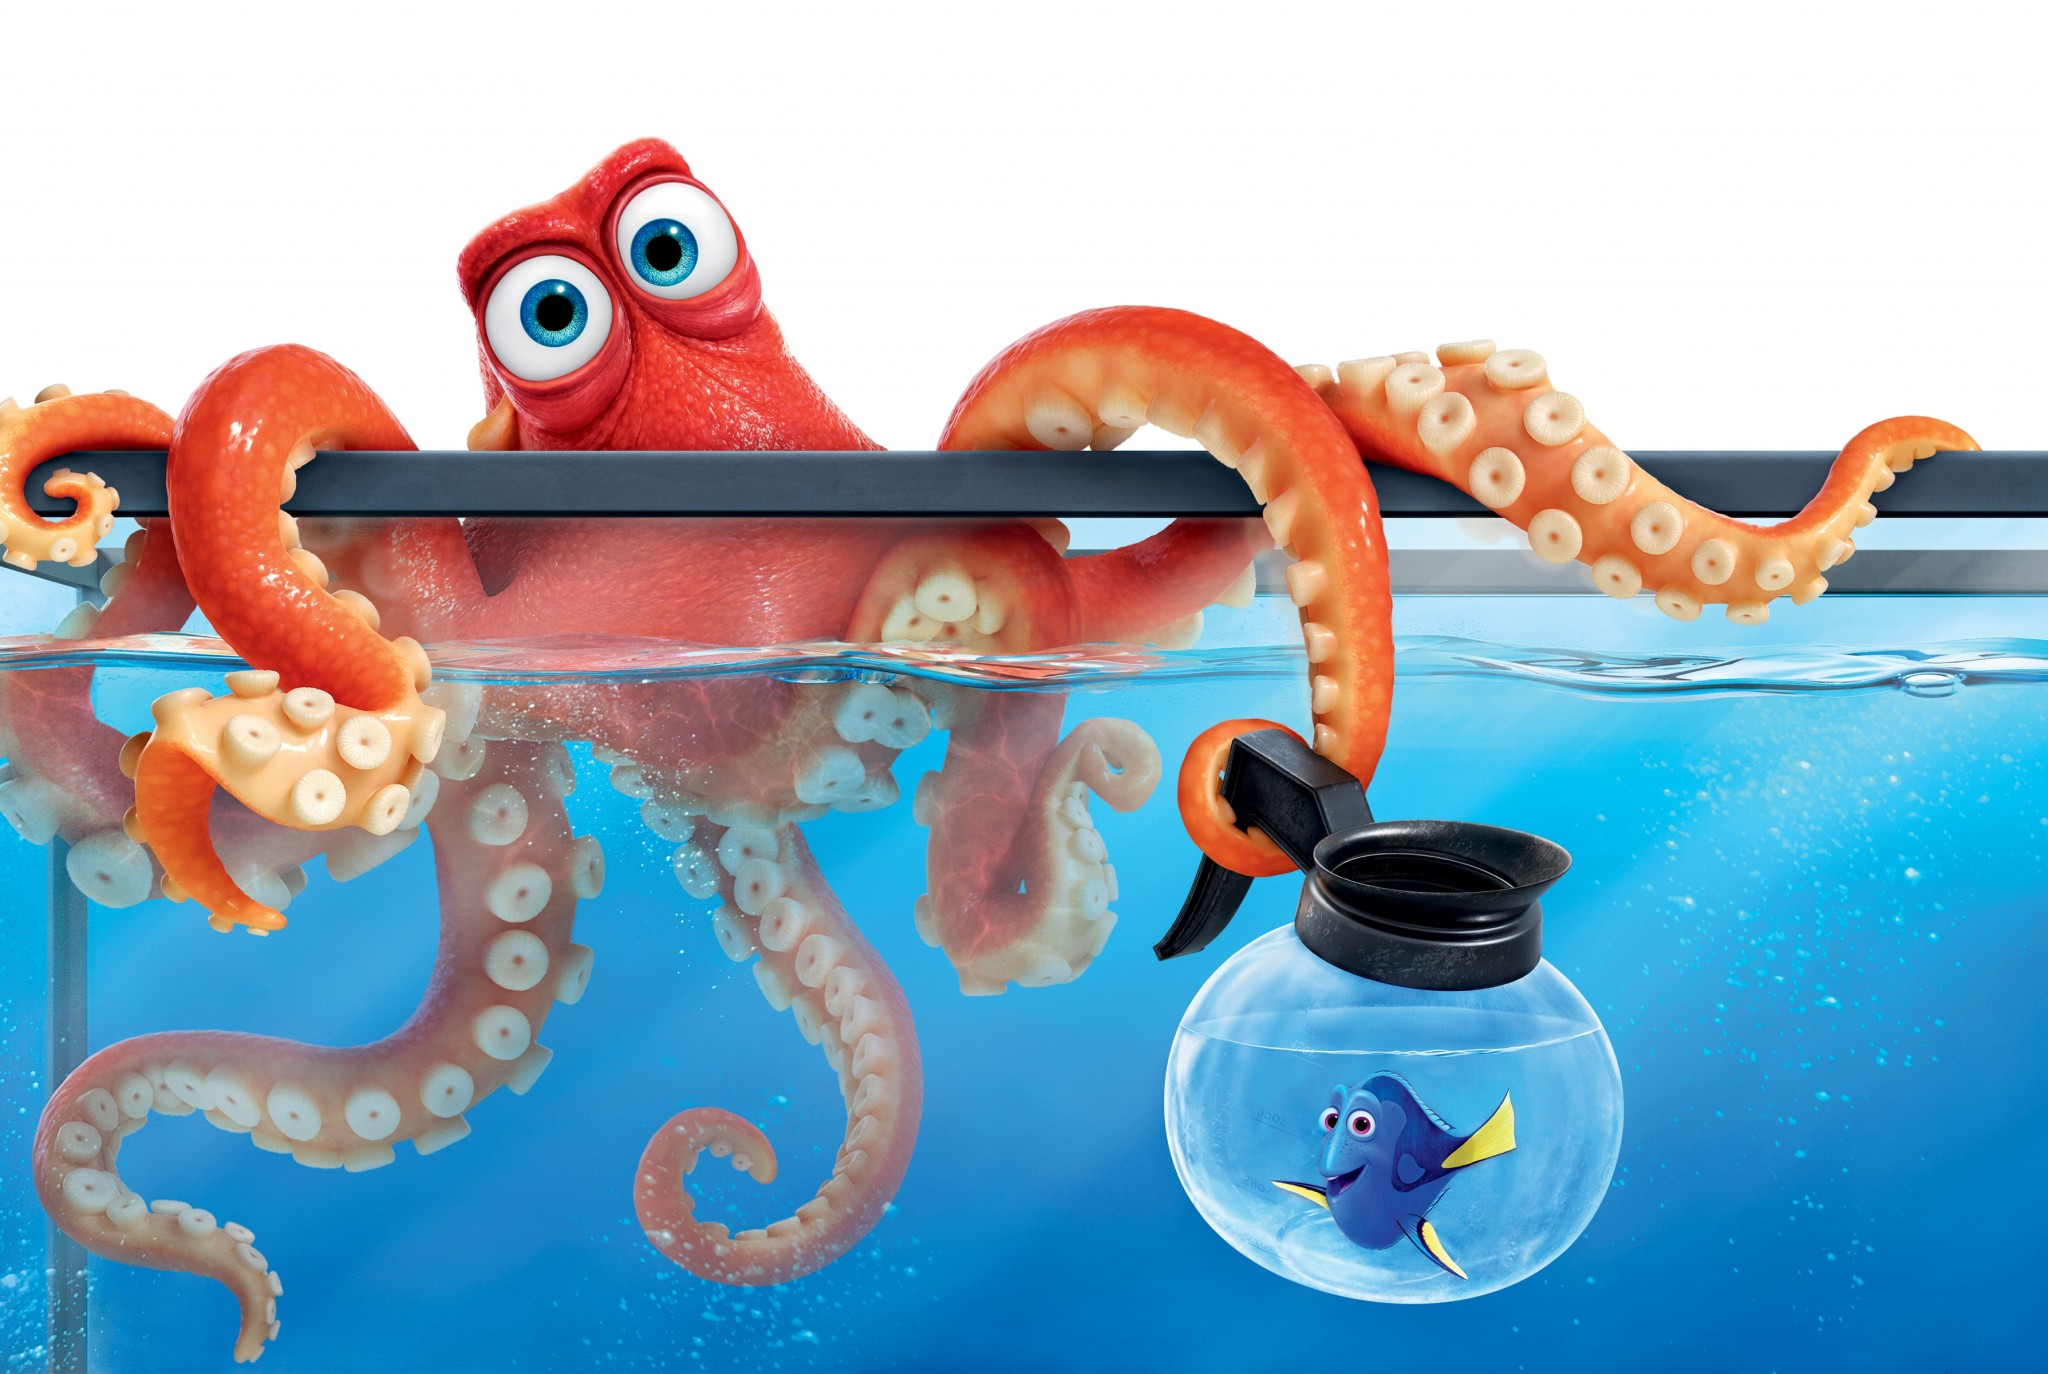 Octopus Wallpapers - Top Free Octopus Backgrounds